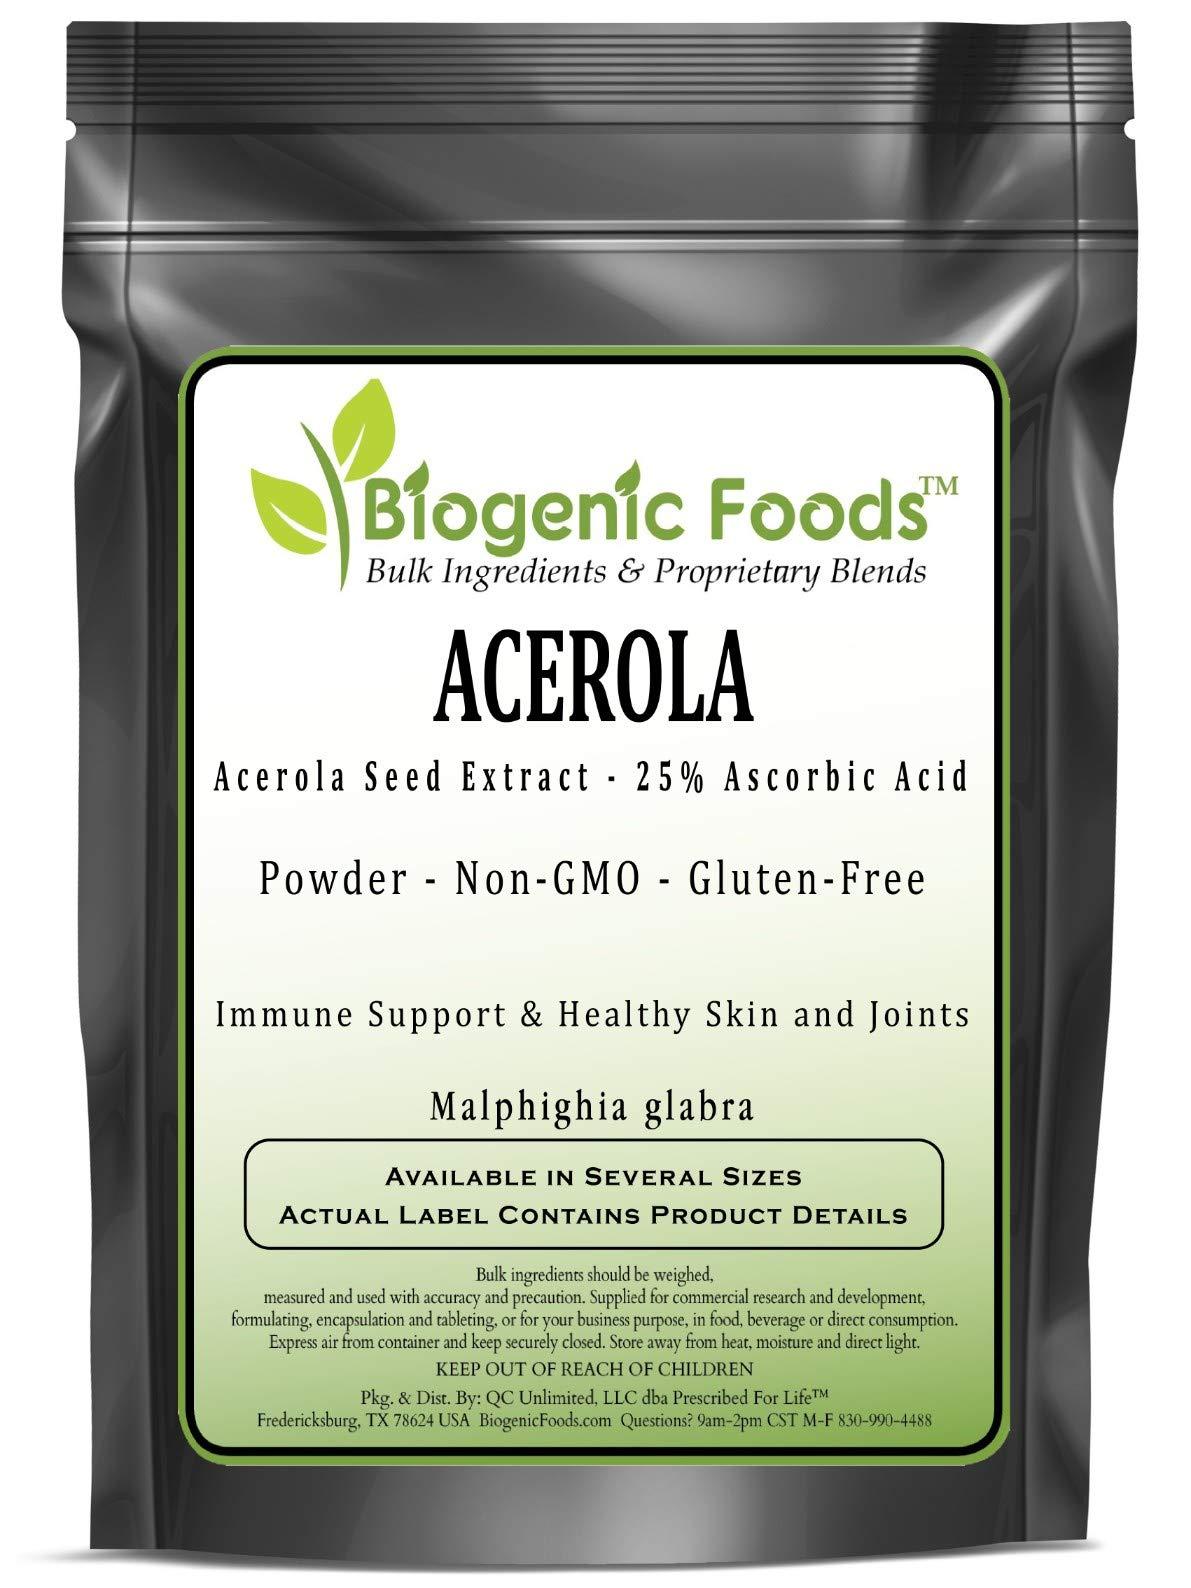 Acerola - Acerola Seed Extract Powder - 25% Ascorbic Acid (Malphighia glabra), 10 kg